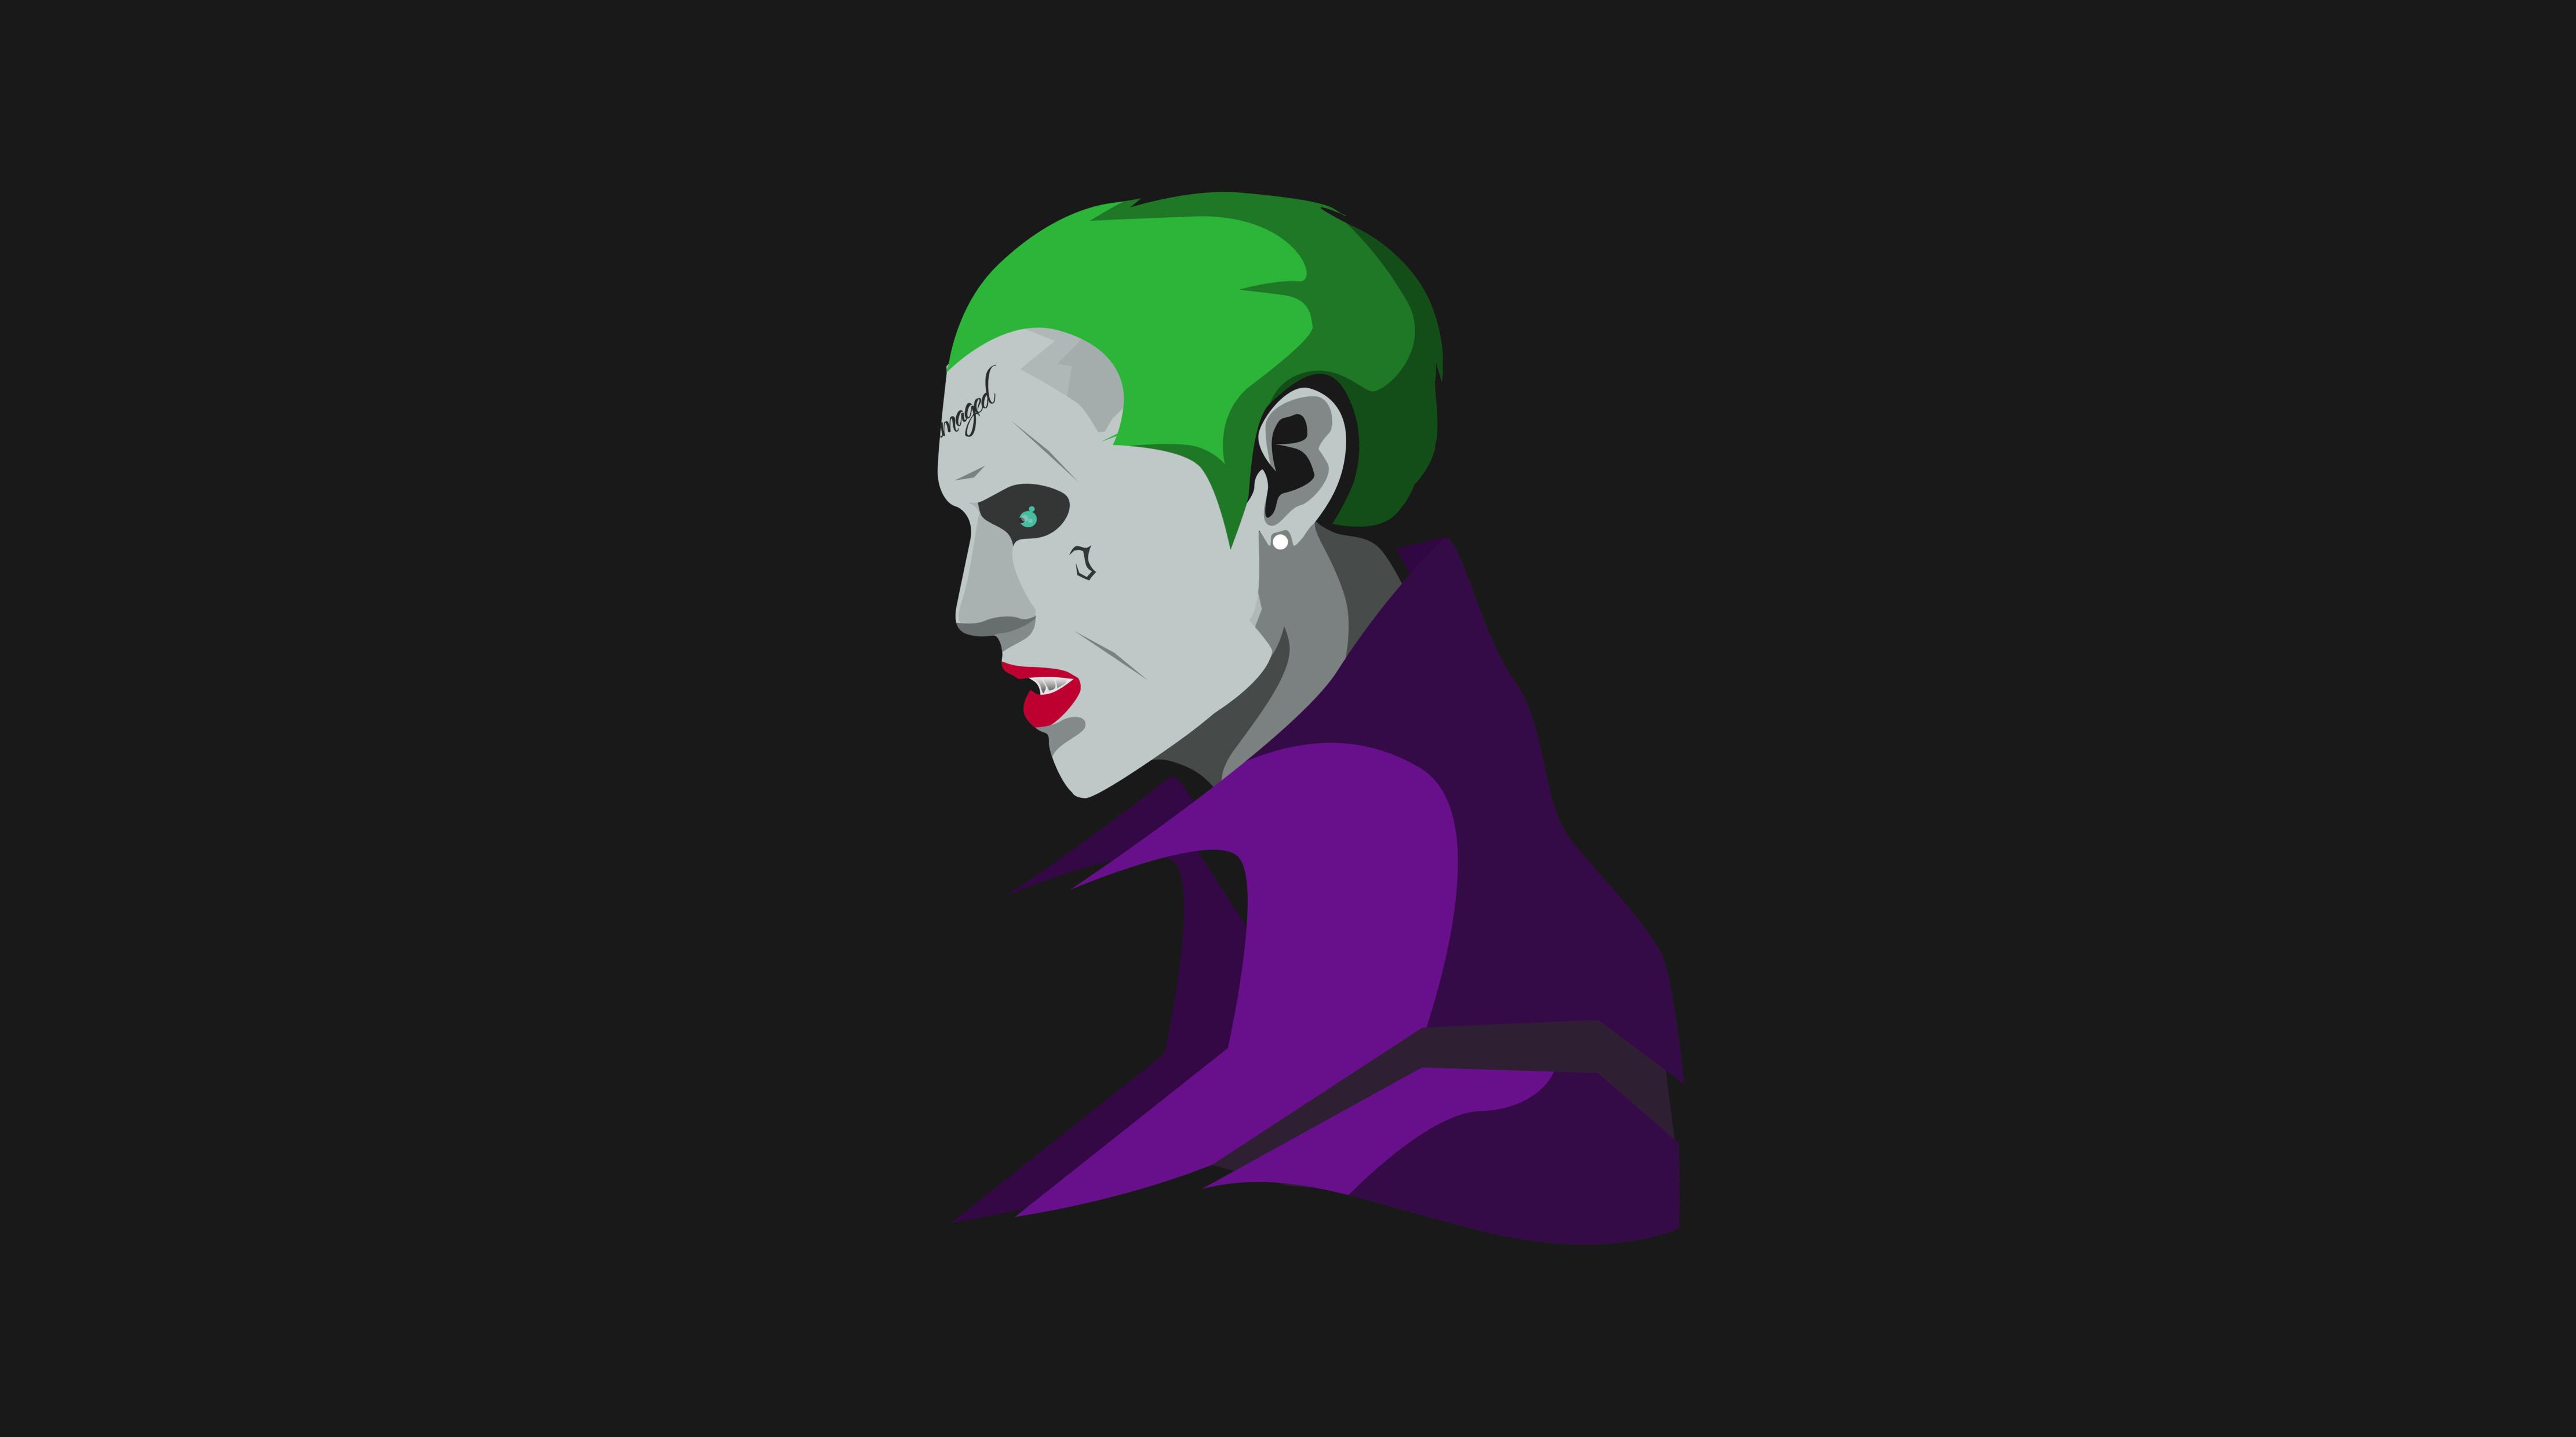 Download Wallpaper Suicide Squad Joker 4k Wallpaper Download